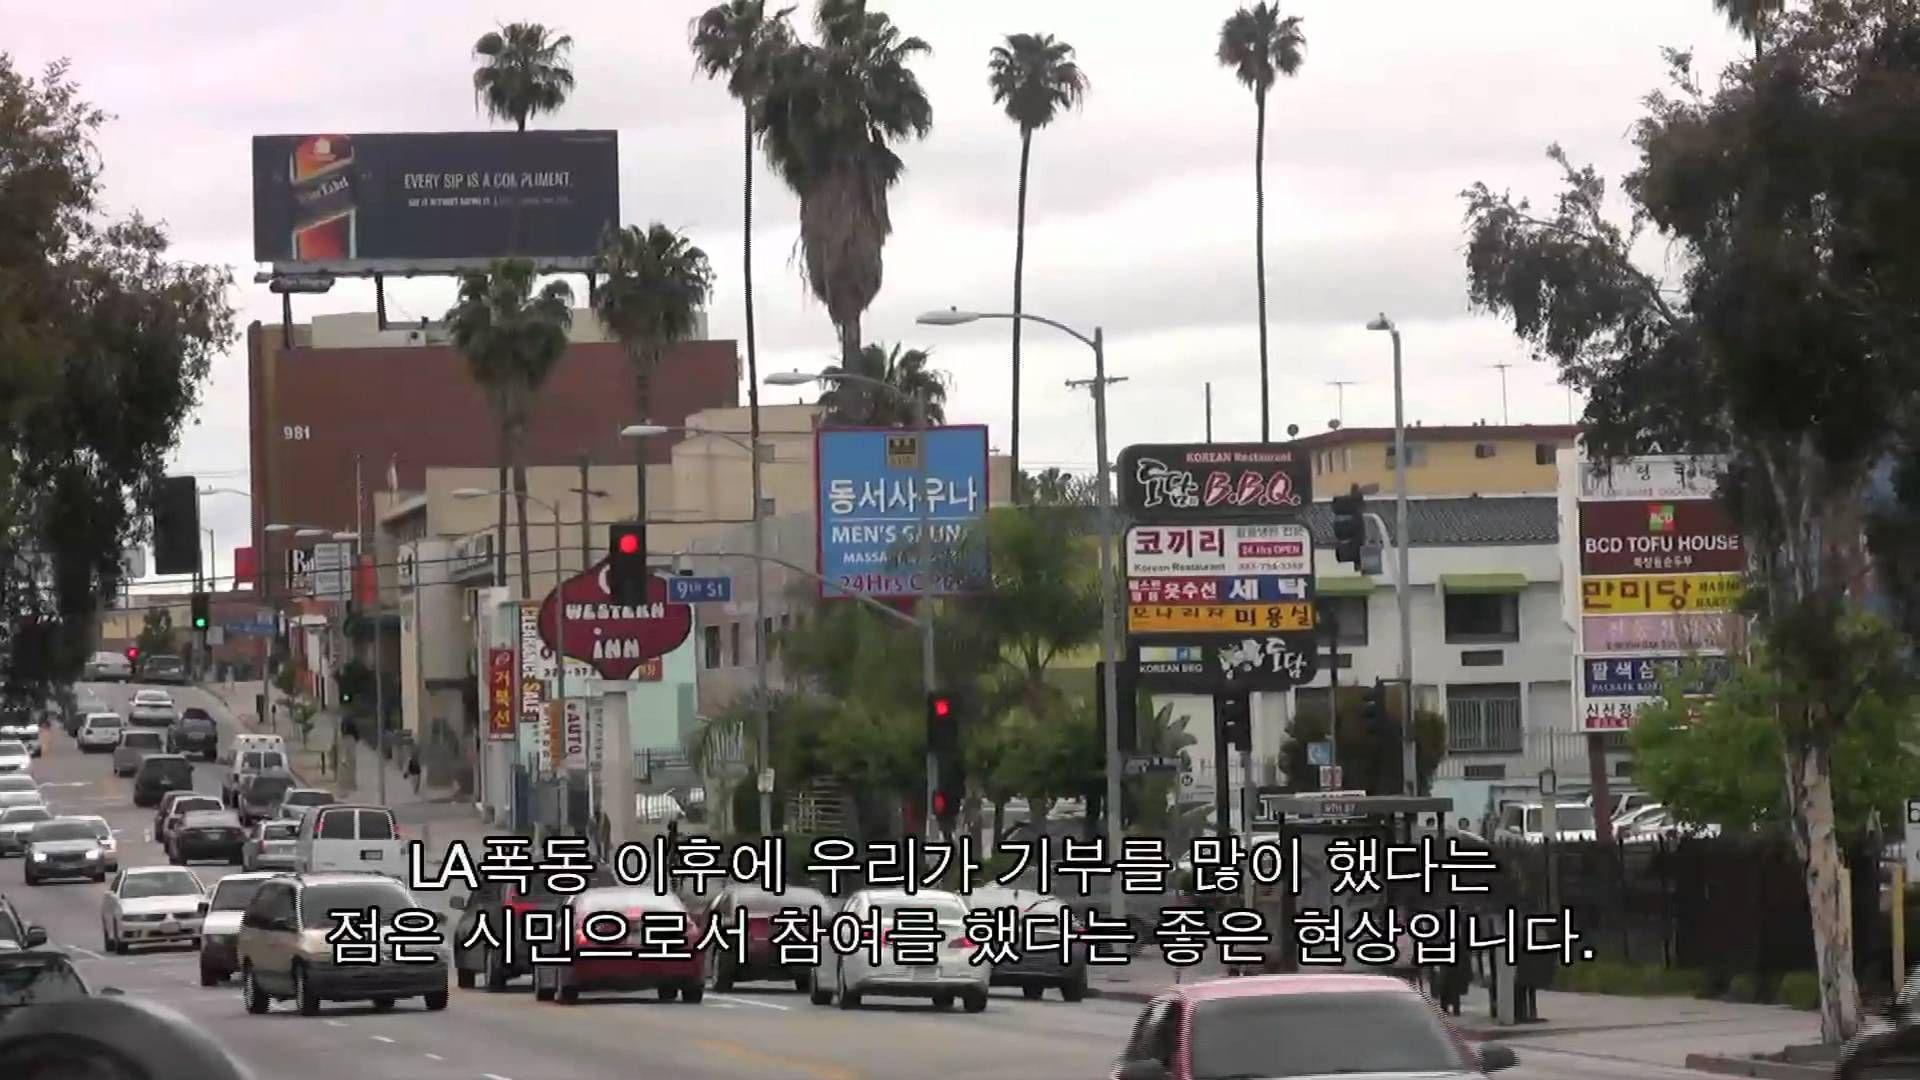 Image Result For La Koreatown Blade Runner Koreatown Image